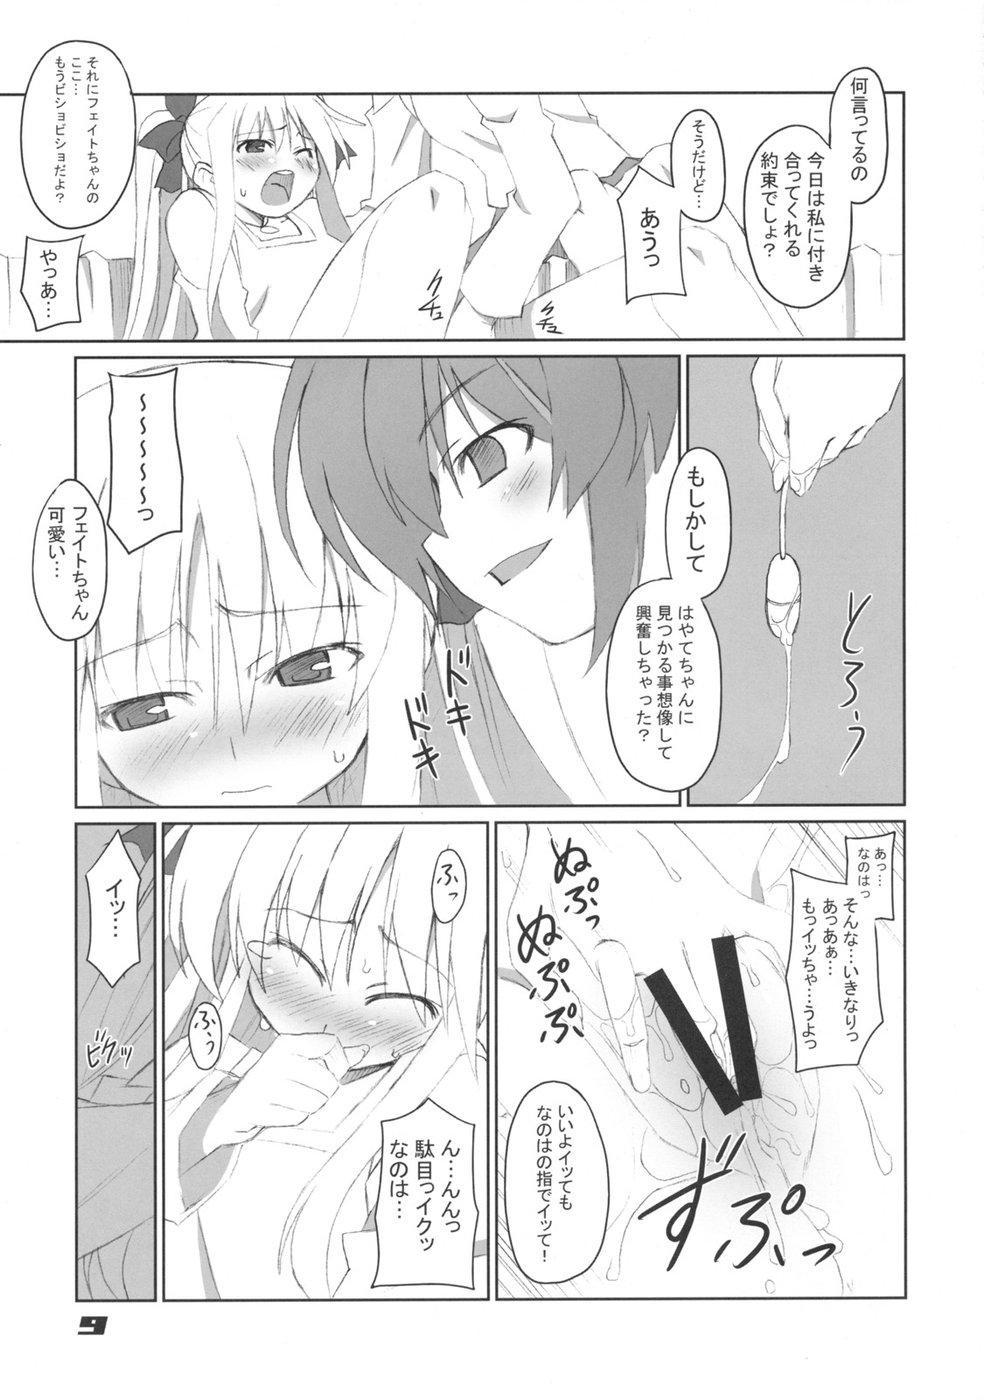 Fate-chan Igai to Moroi no A's 8